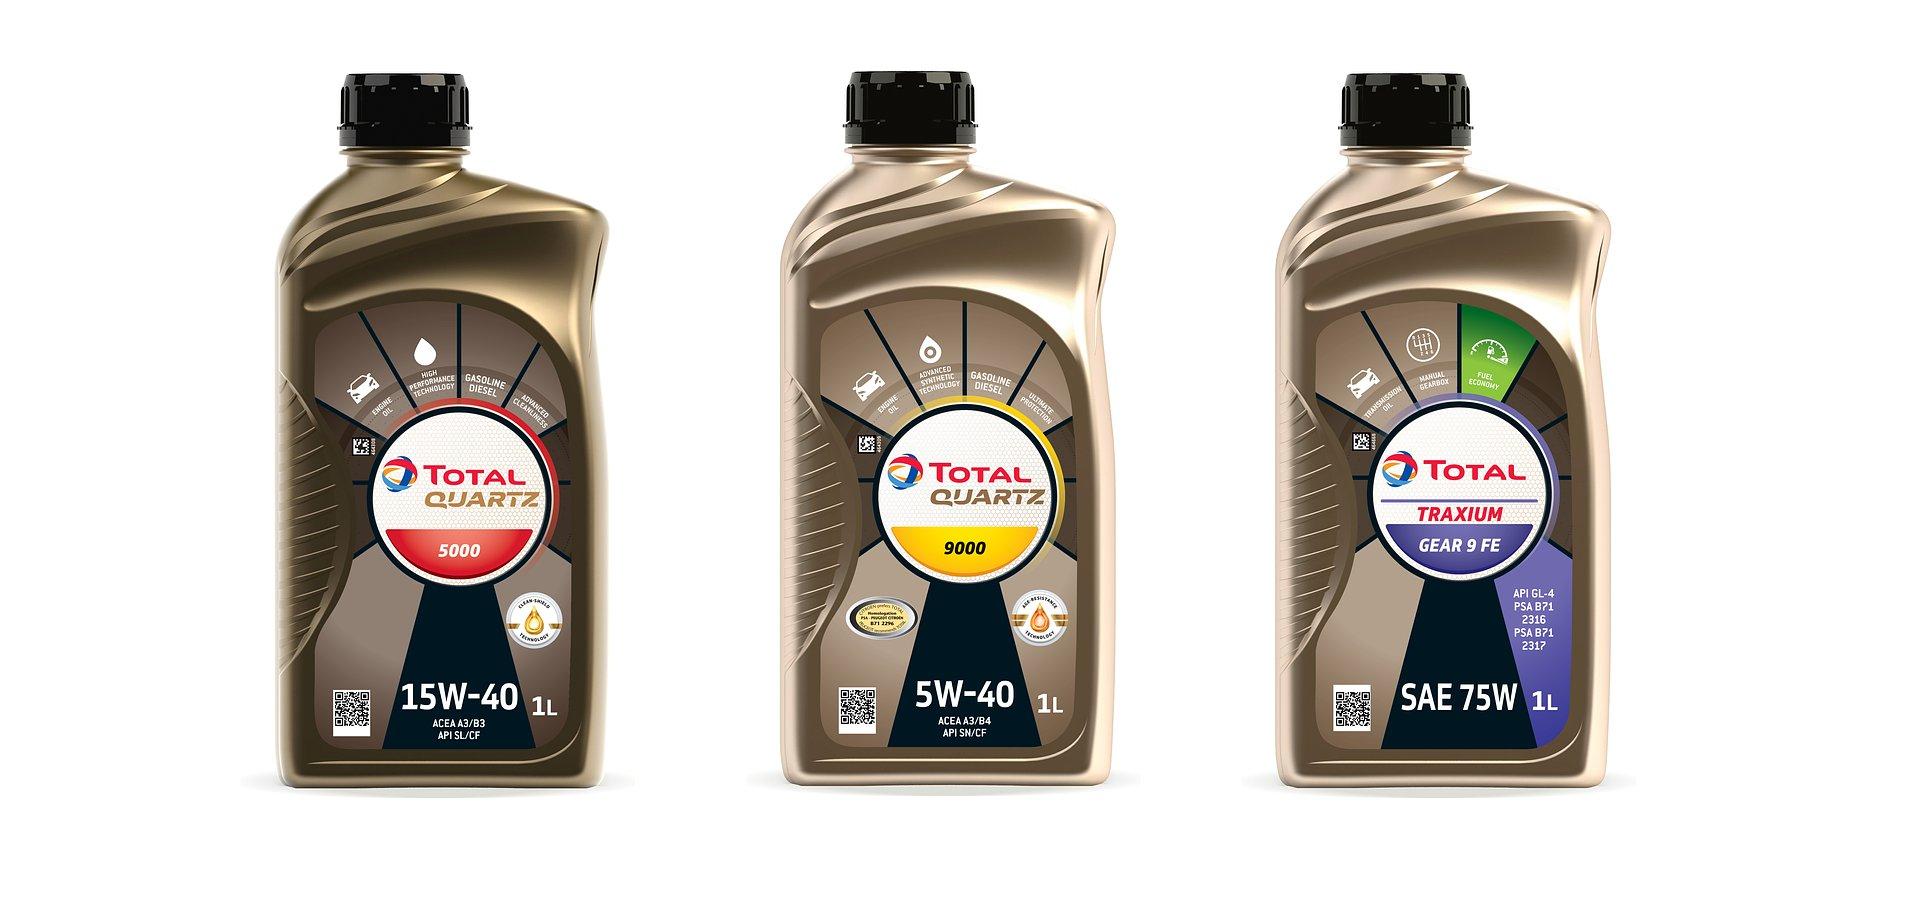 Total Lubrifiants prezentuje nowy design opakowań